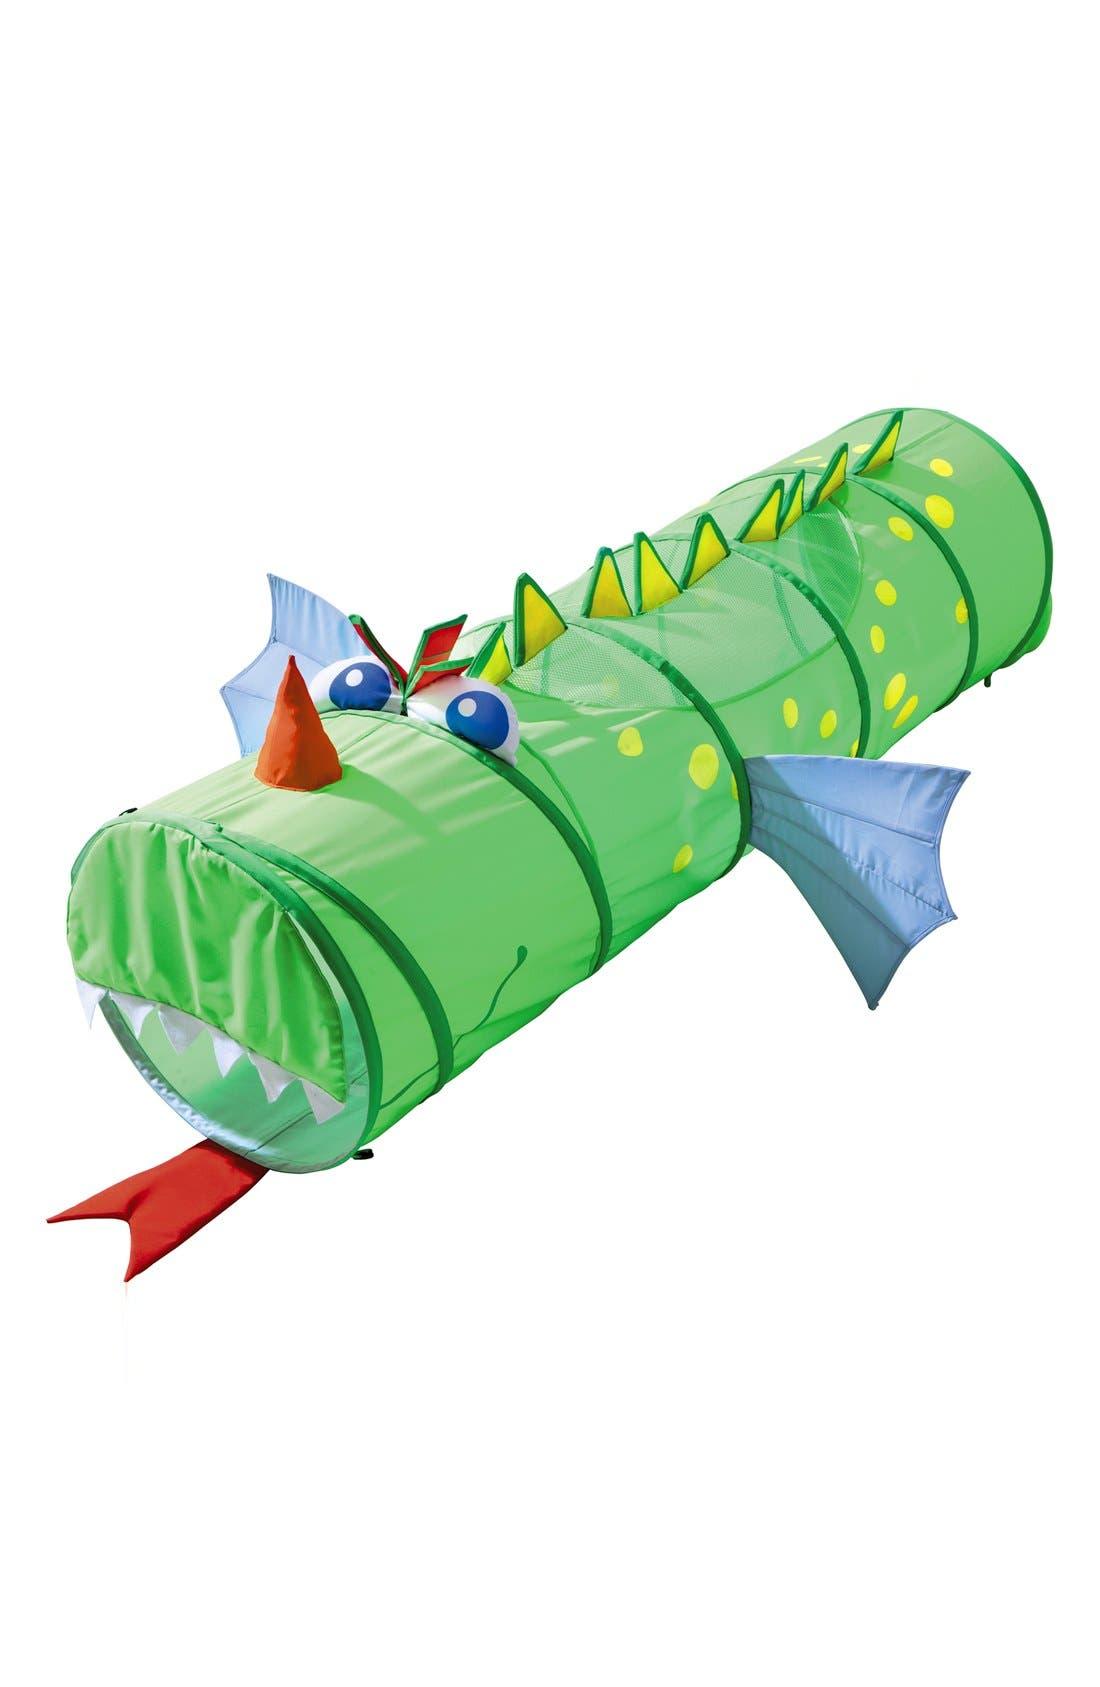 'Croco Kuno' Dragon Crawling Tunnel,                         Main,                         color, Green